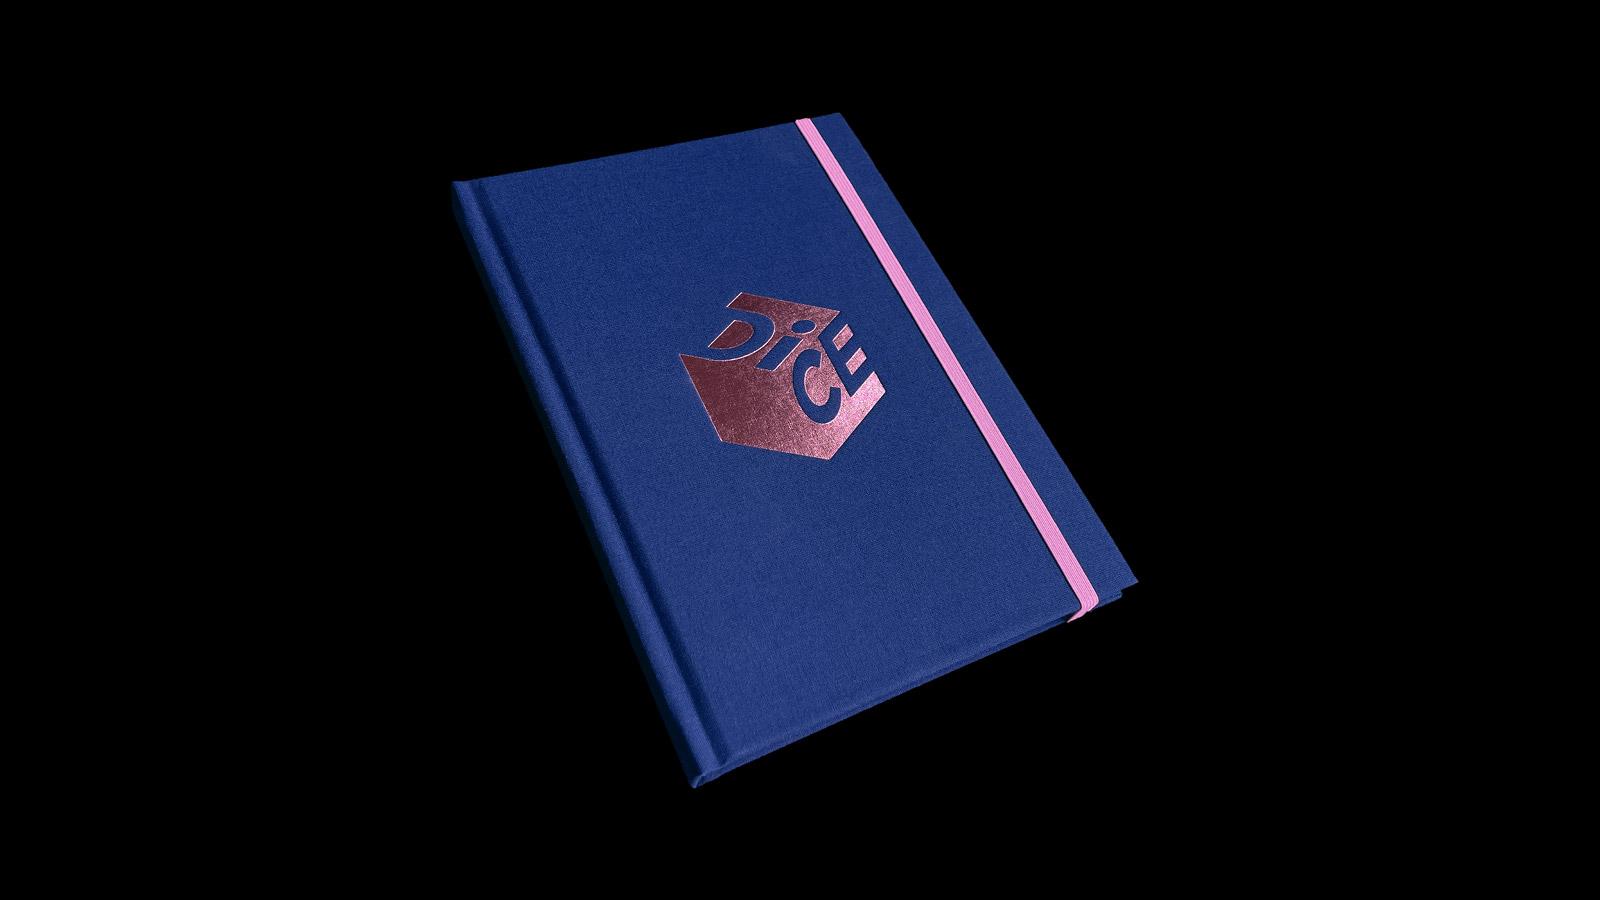 digital-printer-logo-identity-design-branding-milton-keynes-7